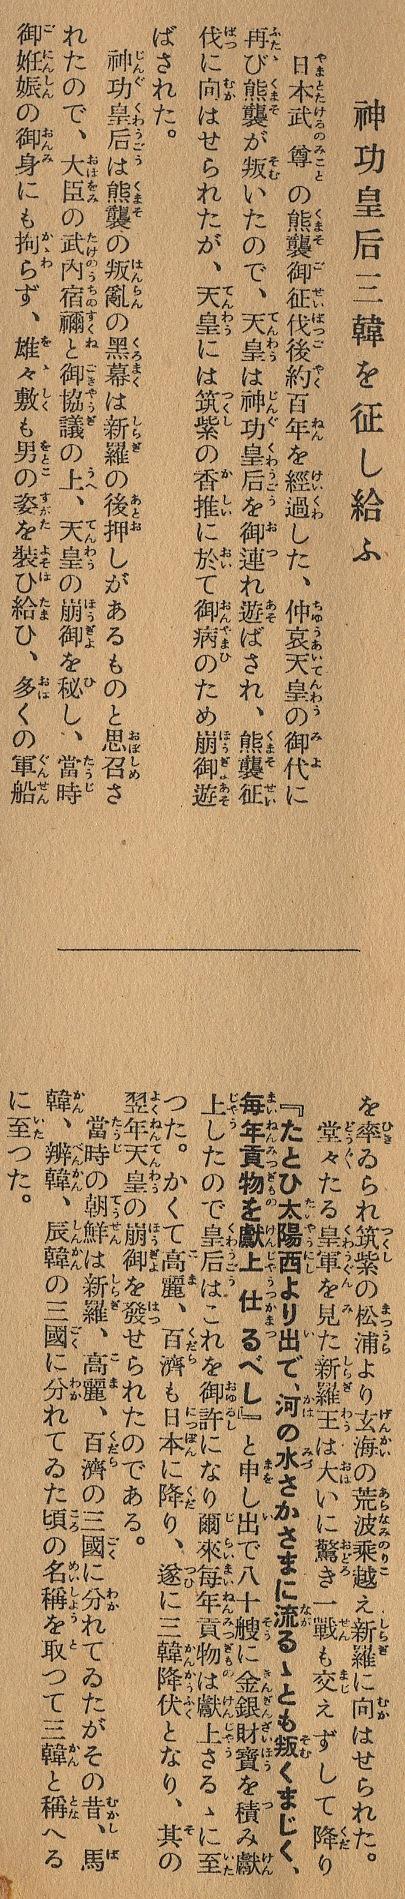 05_jingukogo_sankanwoseisu_ex.jpg